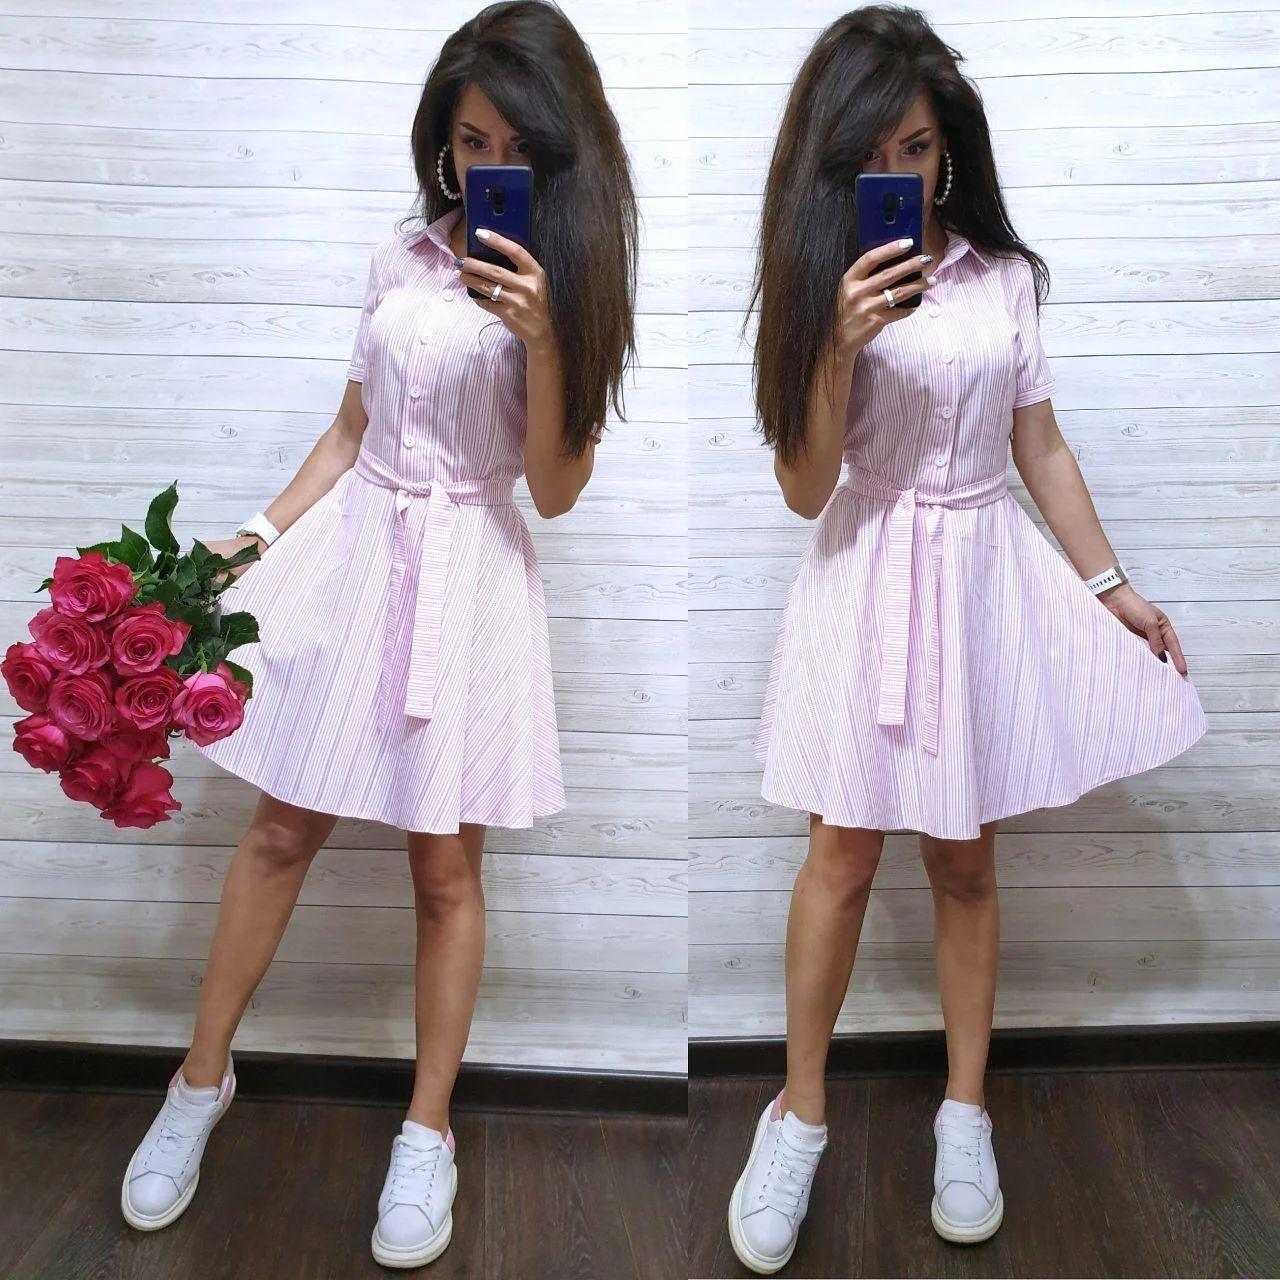 Легке прогулянкове плаття сорочка з бавовни в смужку з поясом